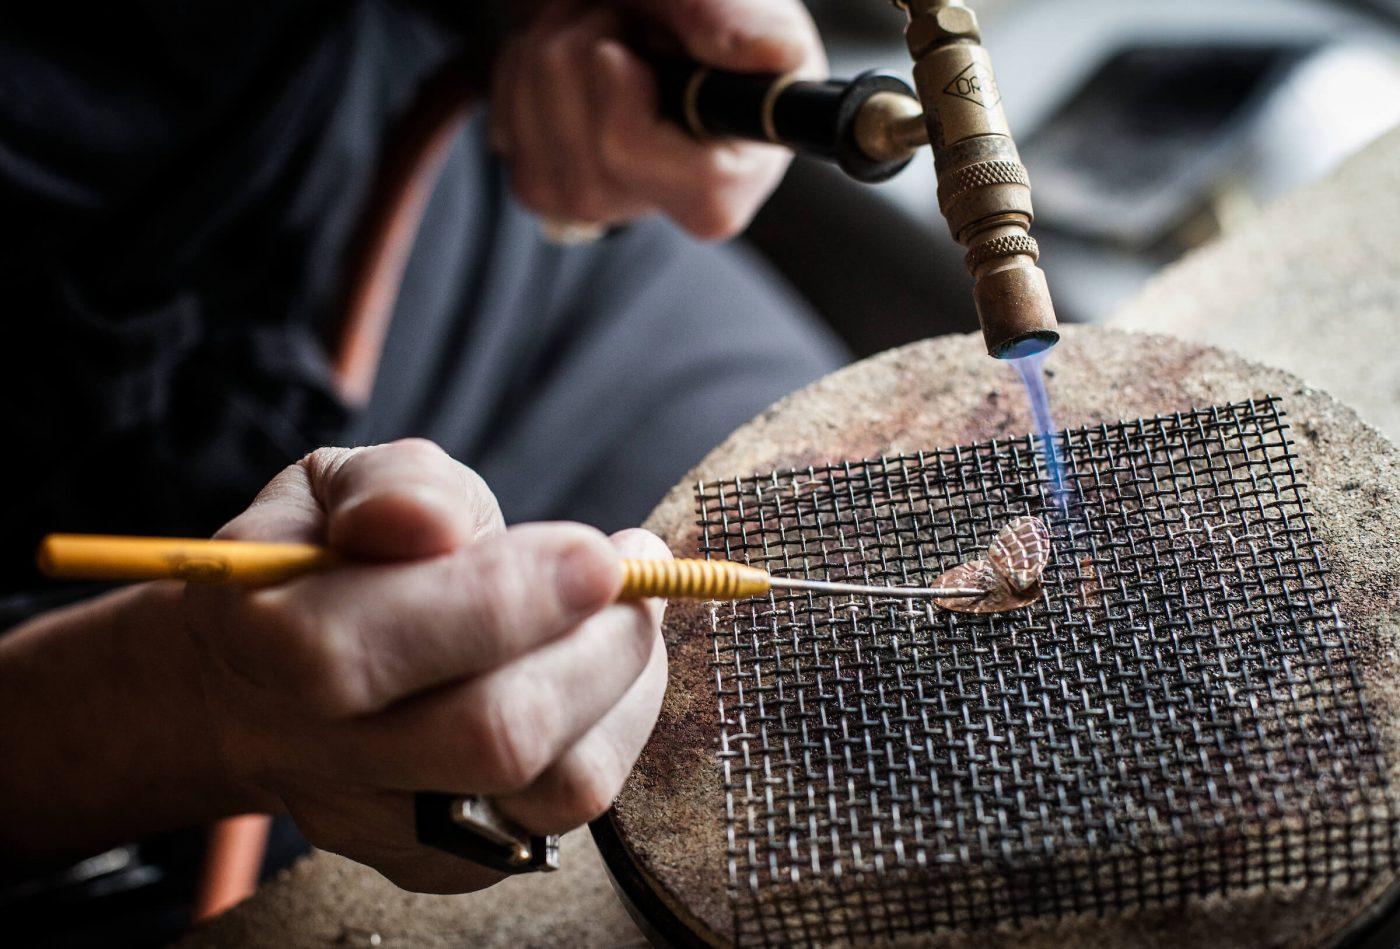 Jewellery maker Marianne Farup Hansen from Kontrast Smykker forging a ring in Sisimiut - by Mads Pihl